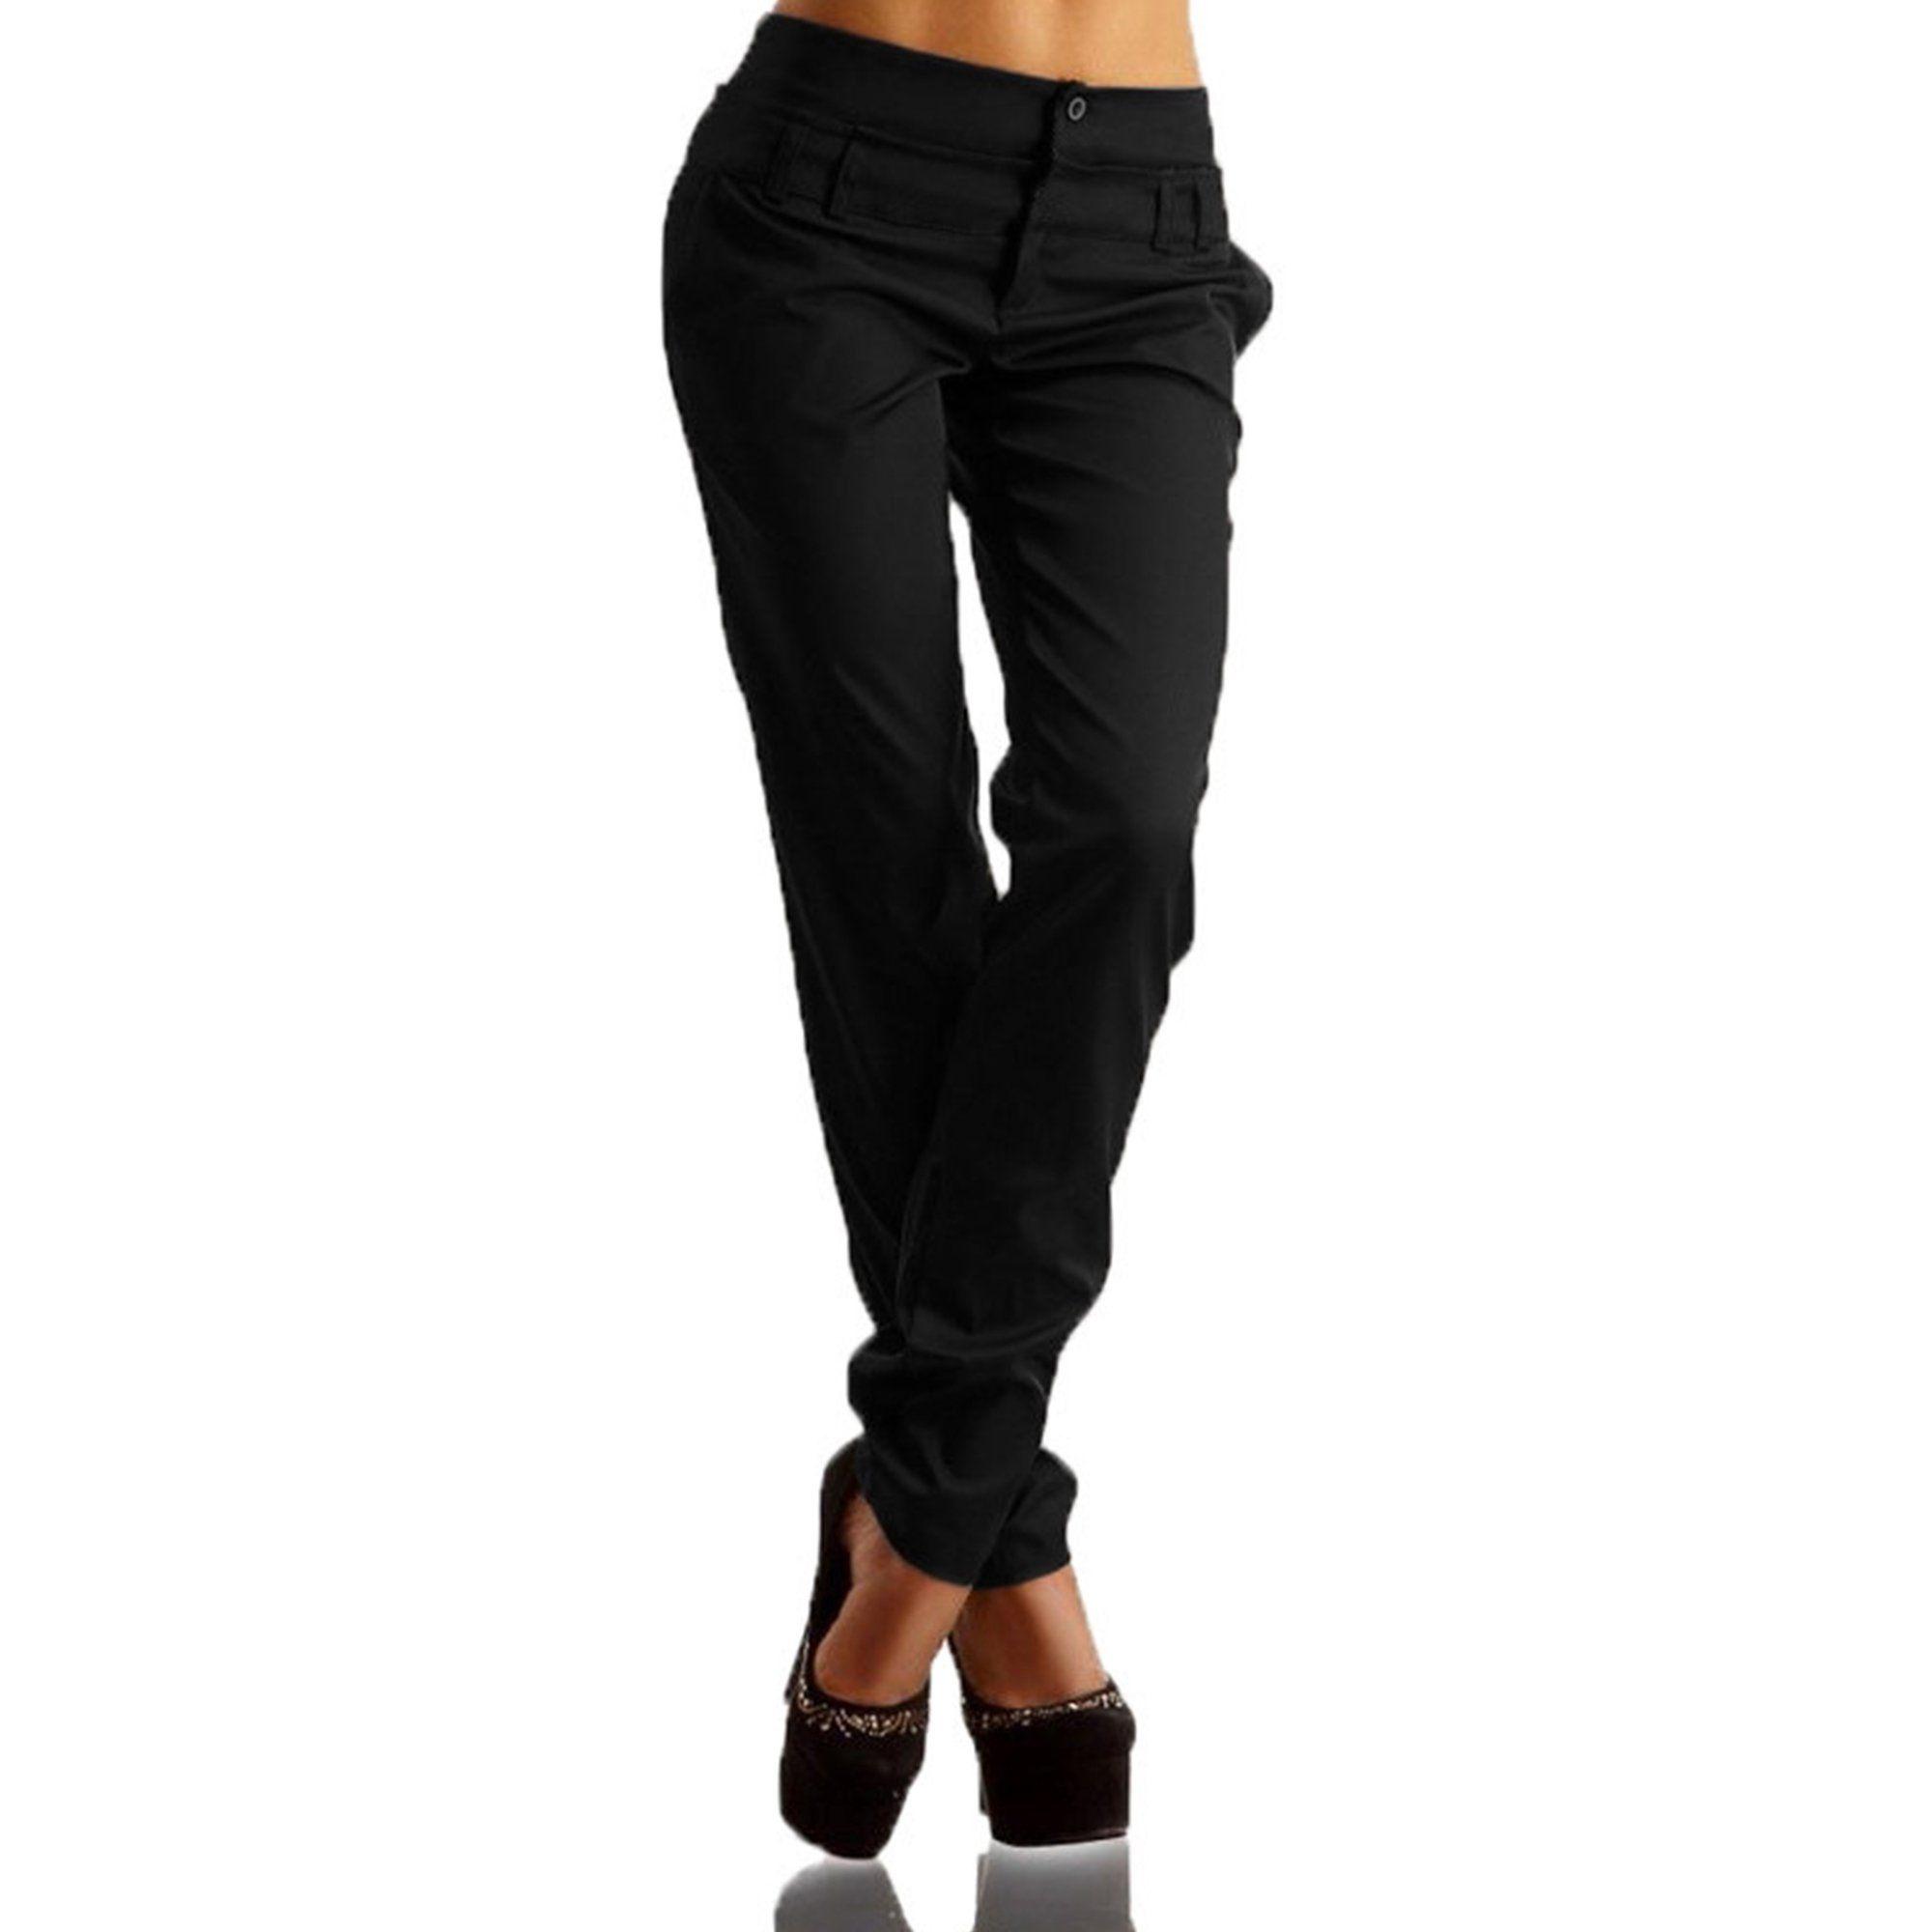 Wodstyle Women S High Waist Buttons Slim Plain Straight Leg Casual Long Pants Walmart Com Womens Long Pants Pants For Women Solid Color Pants [ 2000 x 2000 Pixel ]